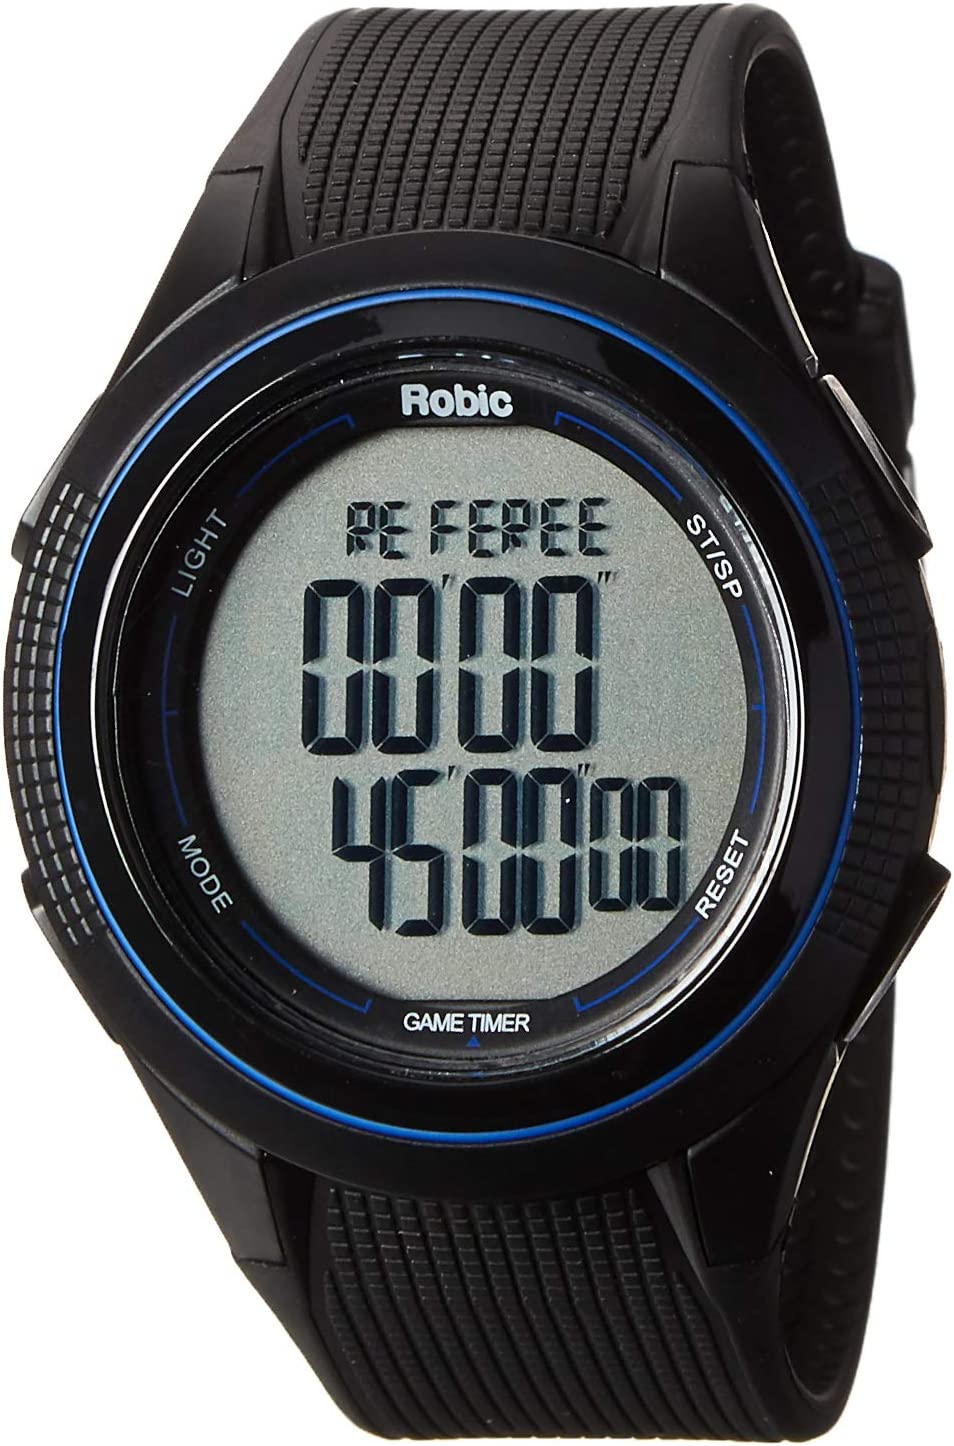 Robic SC-591 Referee Watch